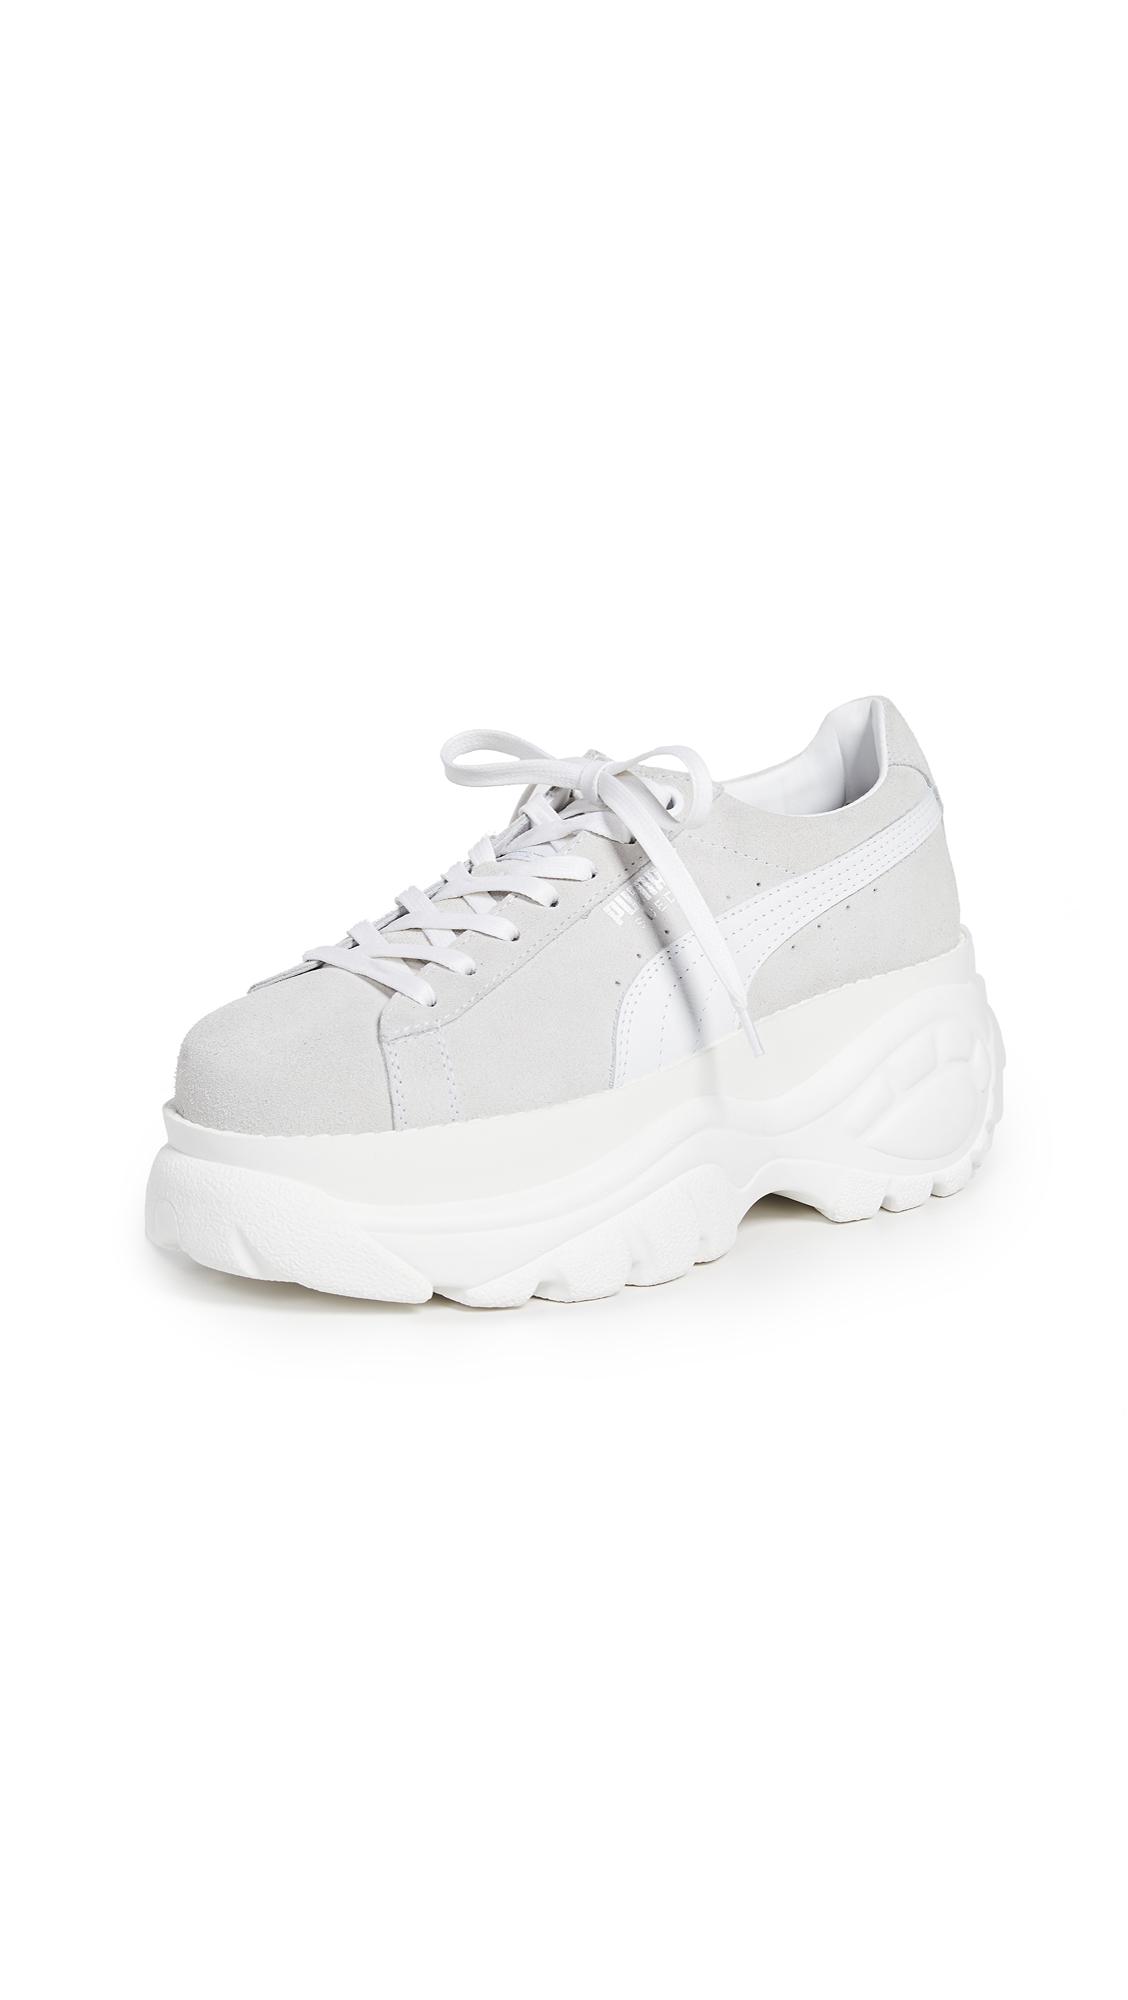 PUMA Suede Buffalo Sneakers - Puma White